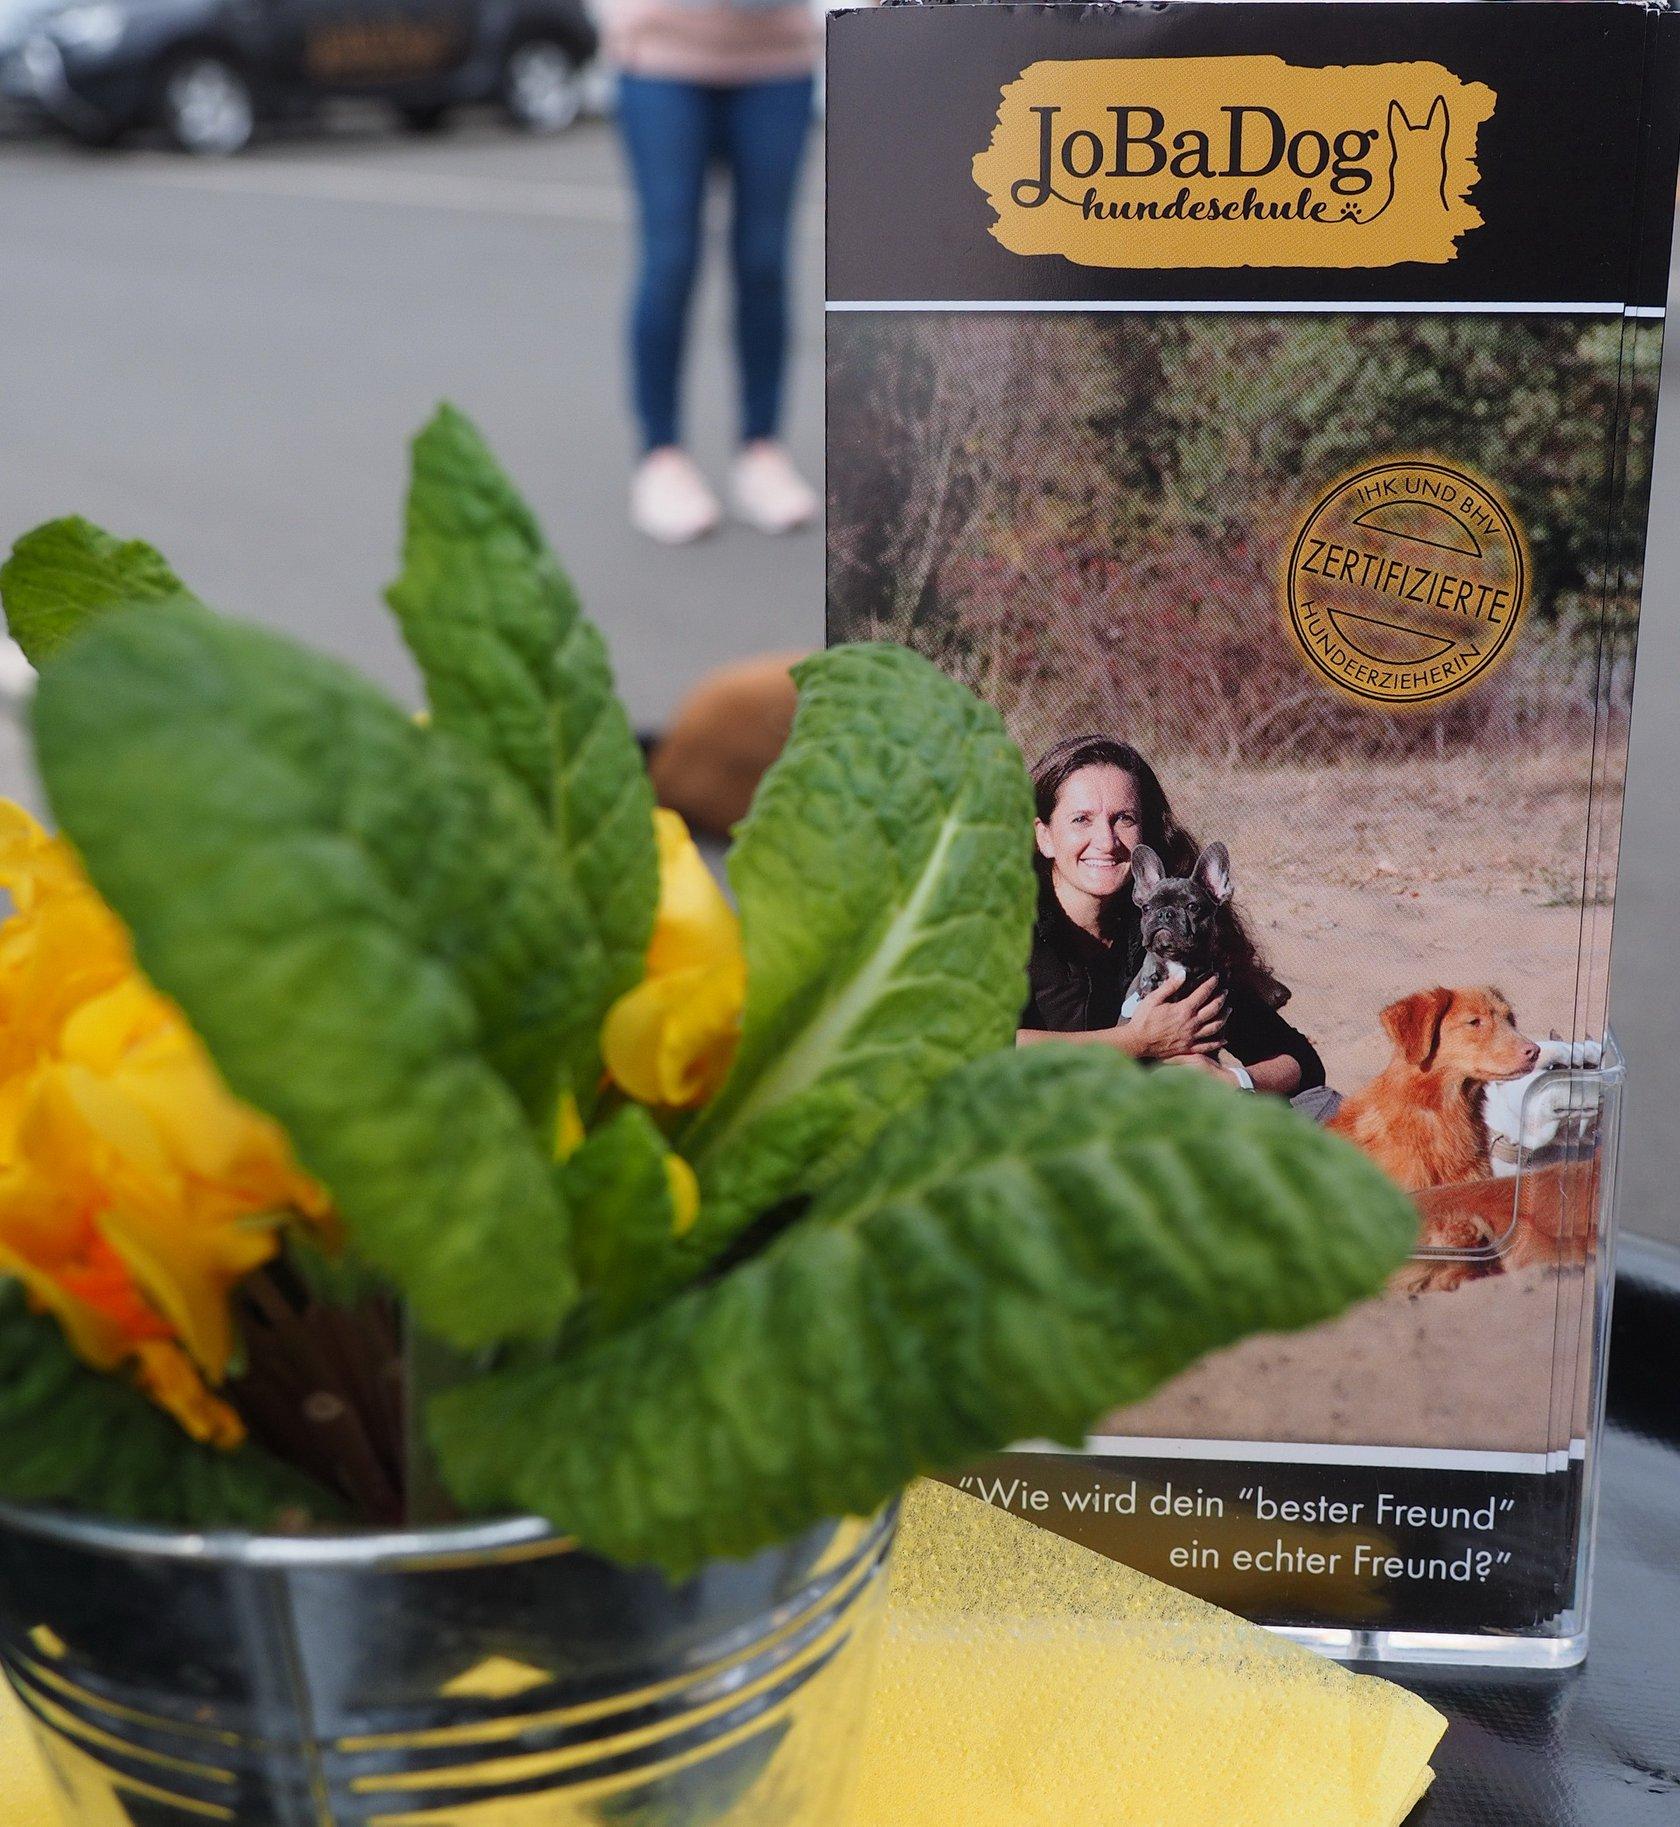 JoBaDog_Frühlingsfest_Fressnapf_Oranienburg_2019_1.jpg